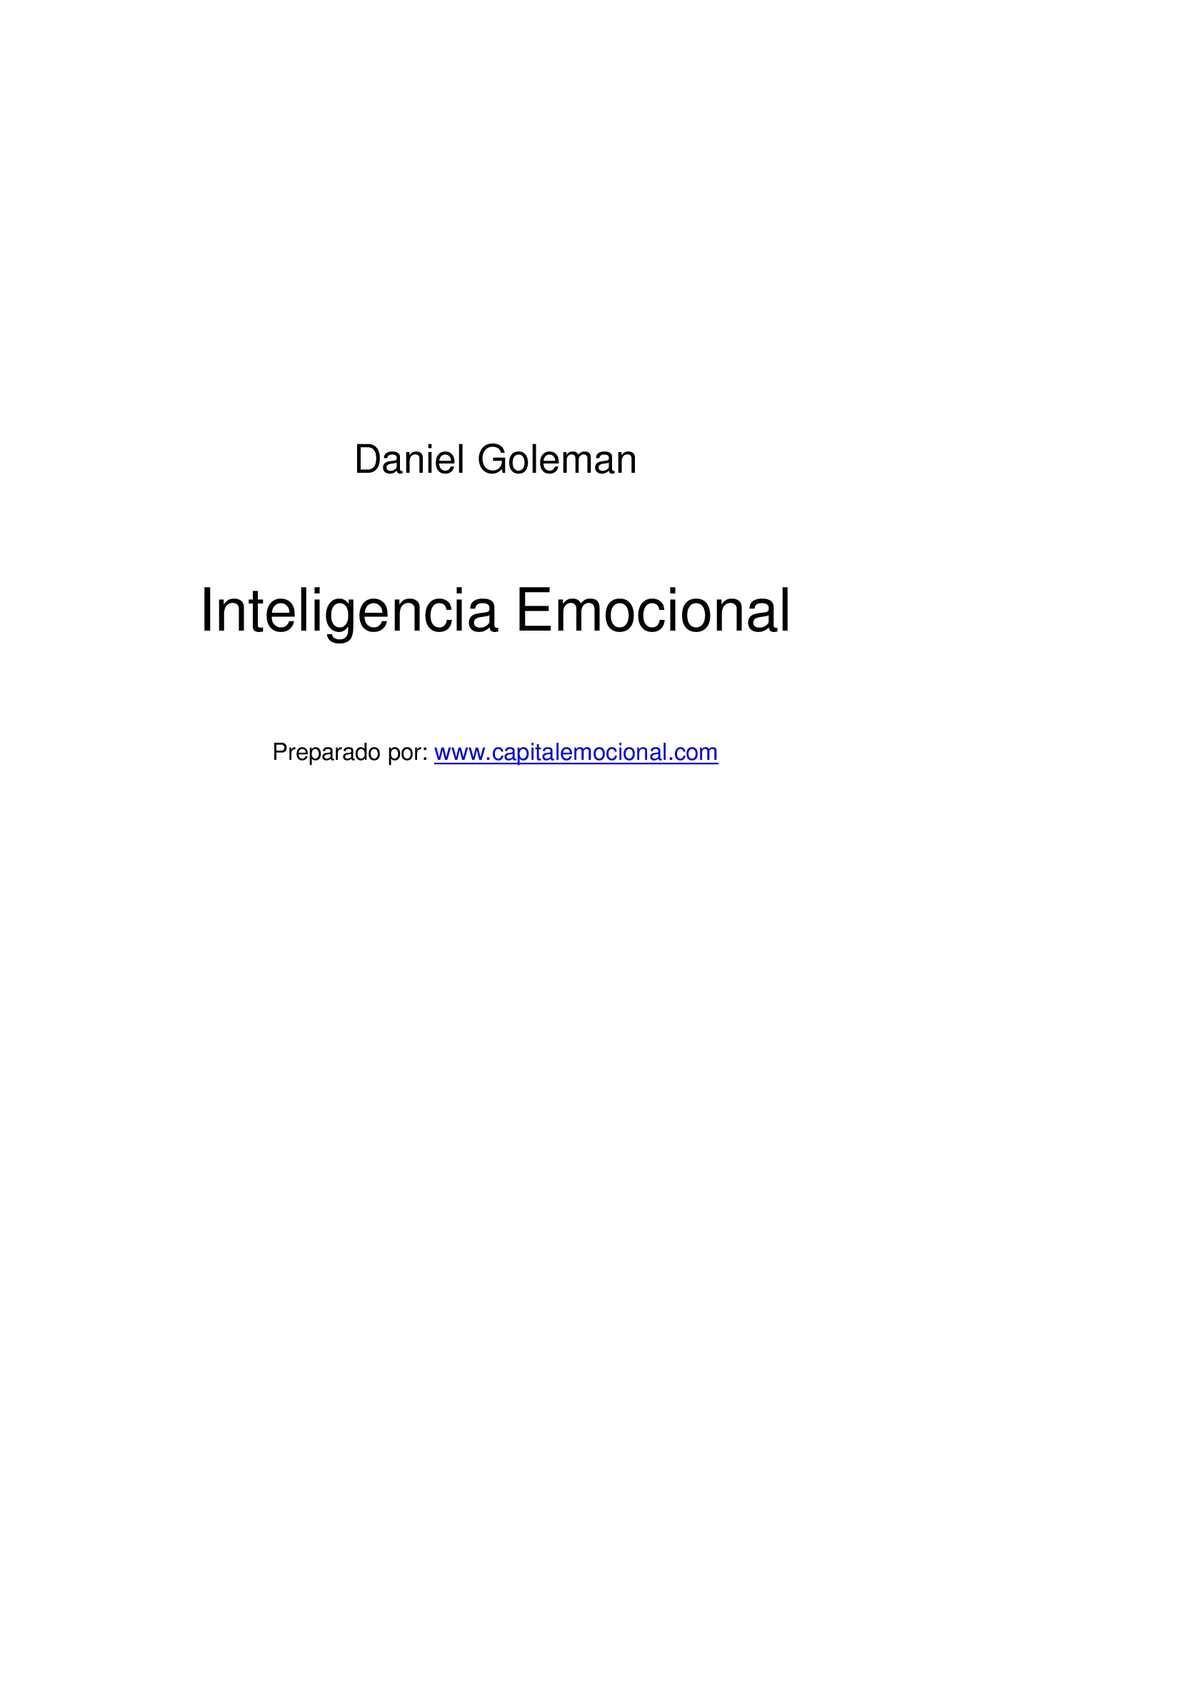 Calaméo - Inteligencia Emocional Daniel Goleman